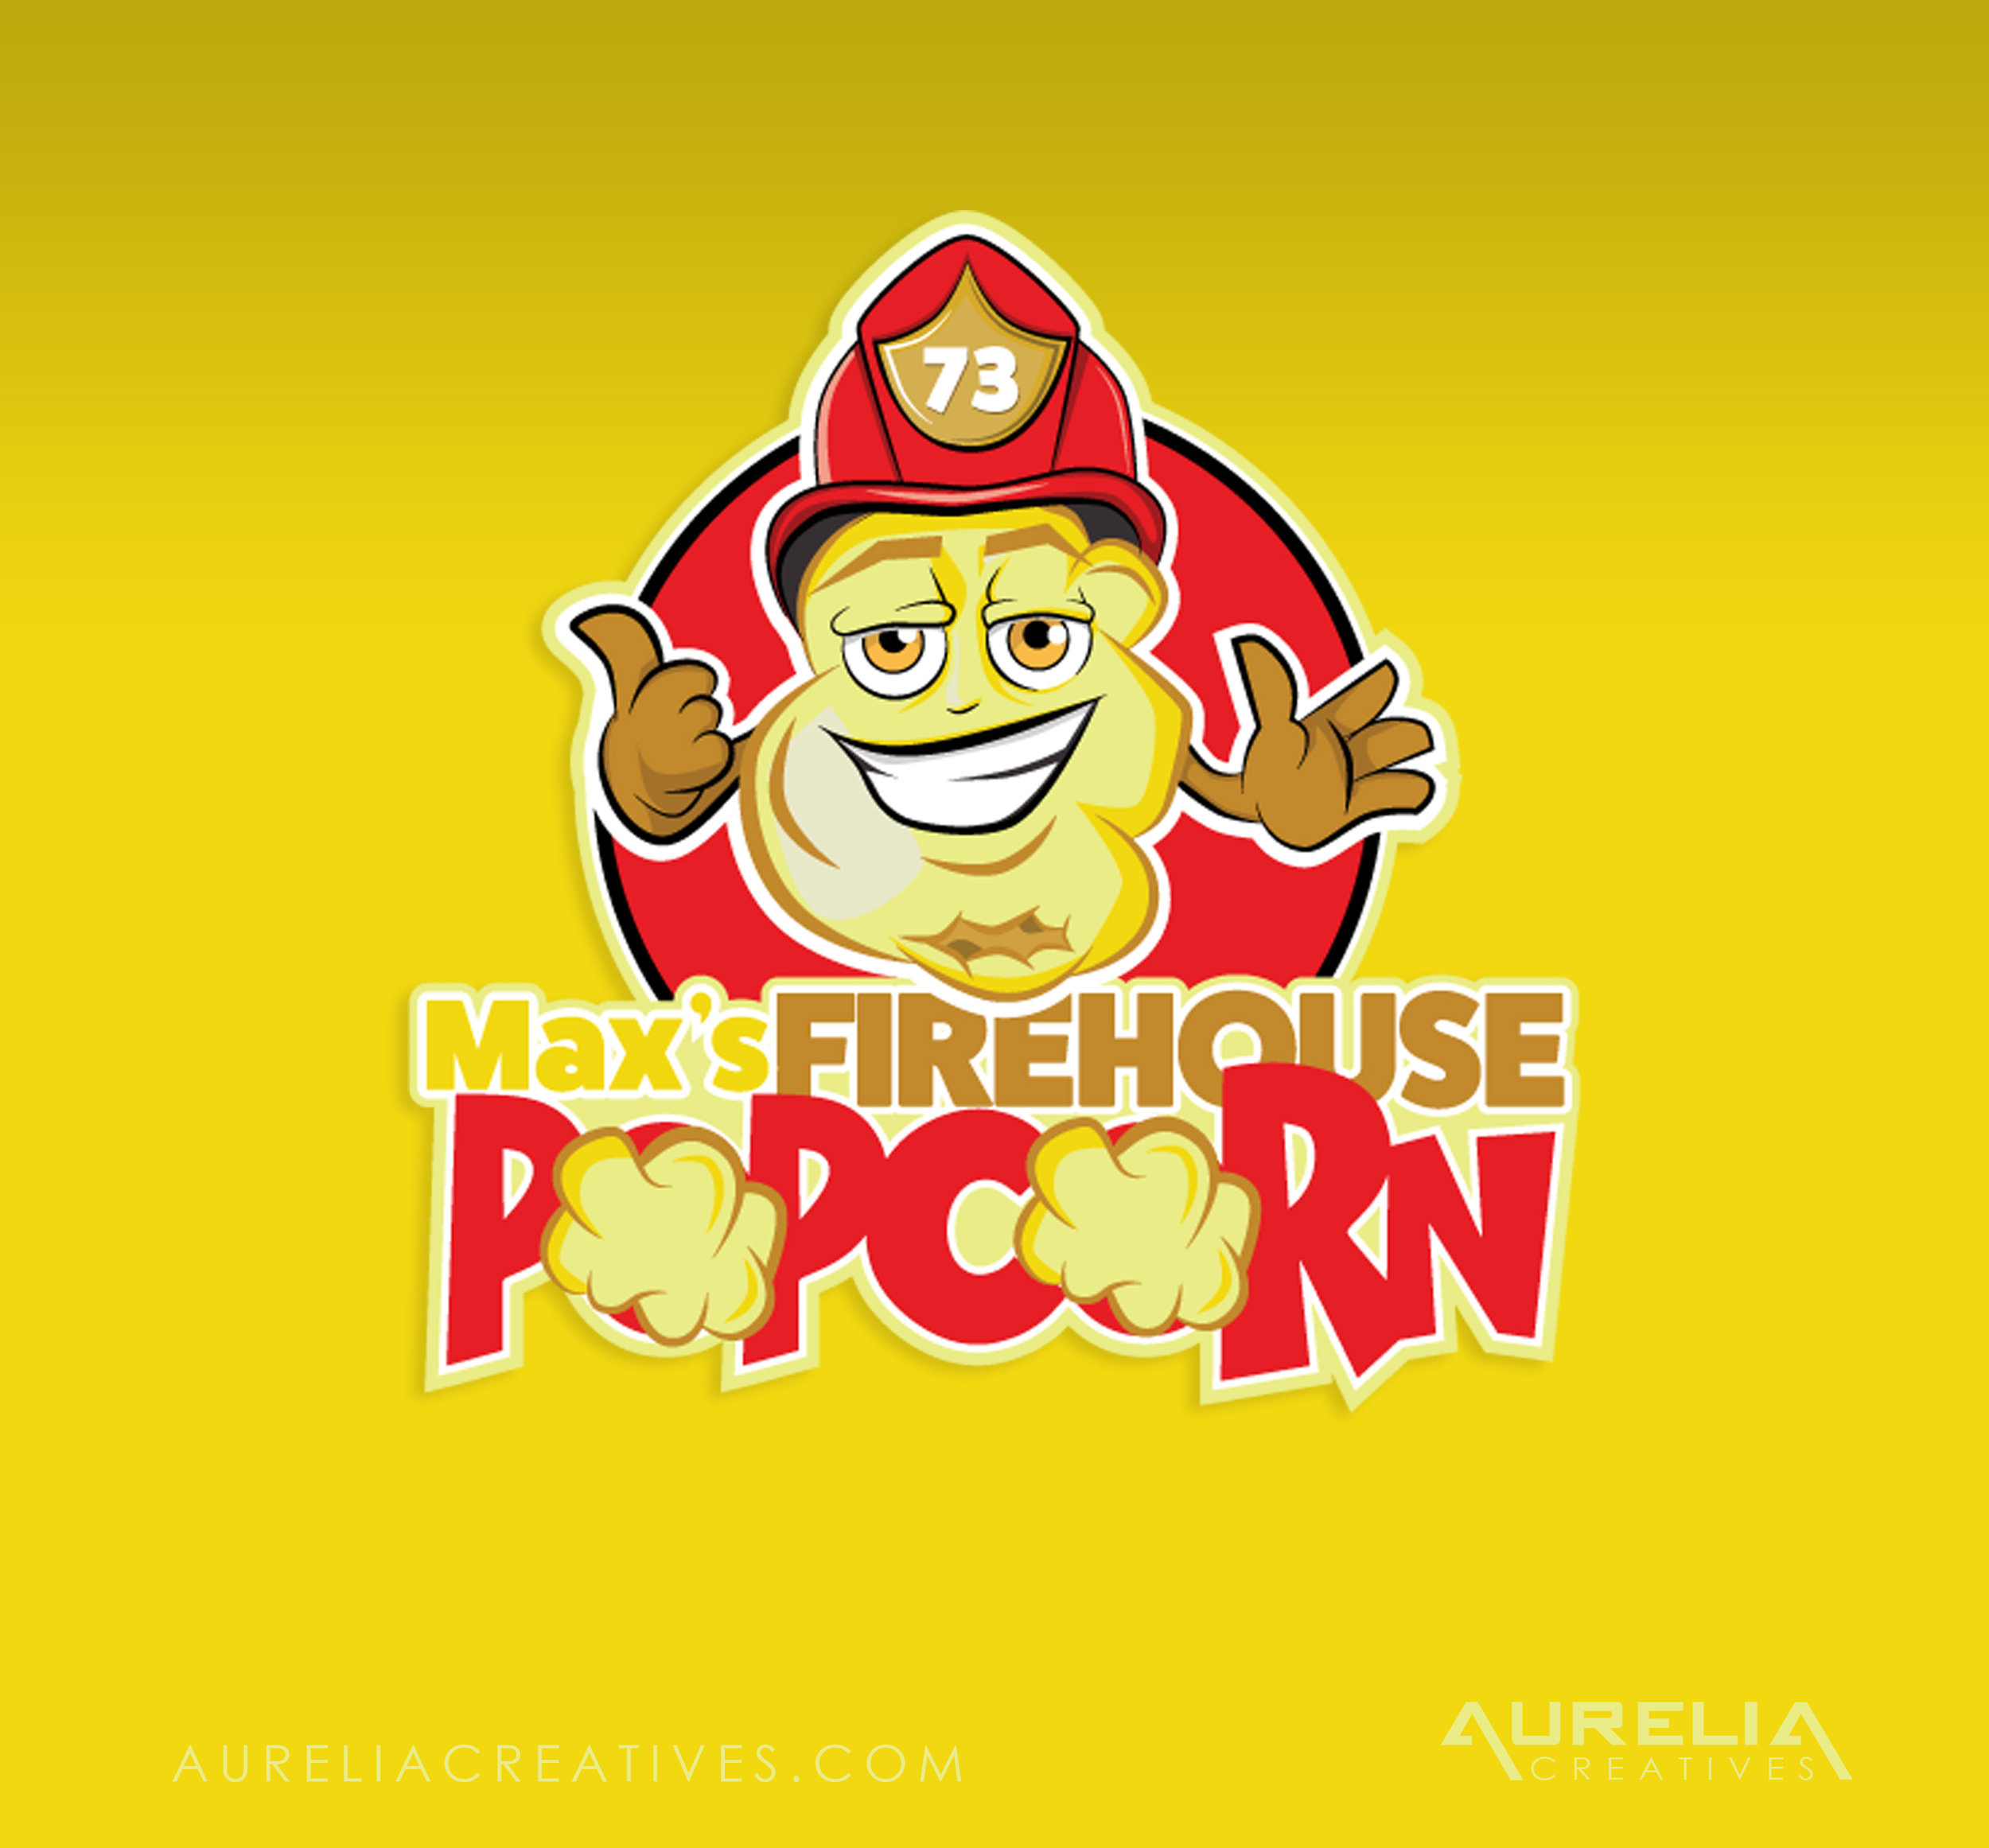 Max-Firehouse-Popcorn-Post.jpg